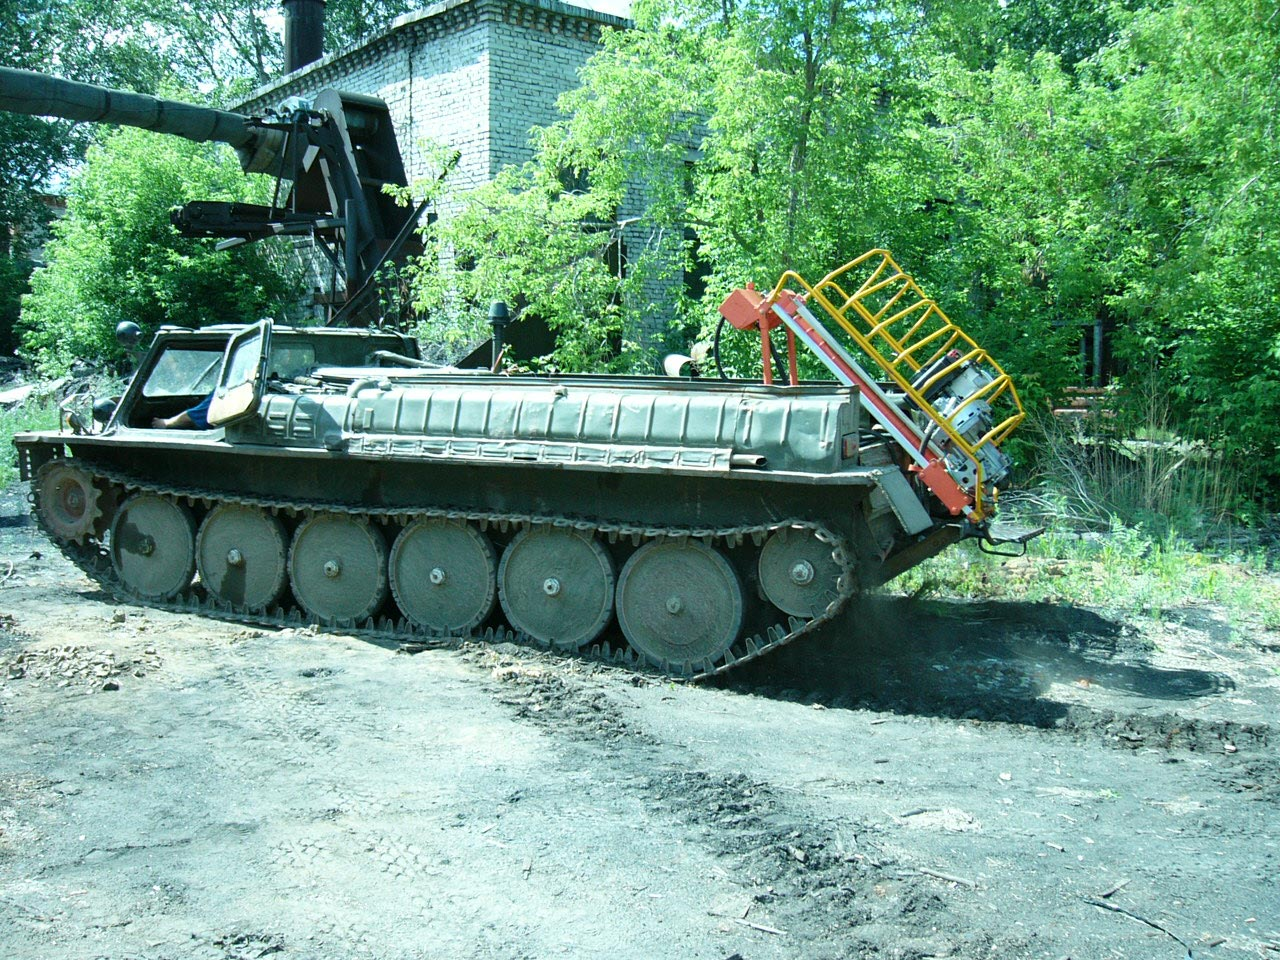 Установка буровая шнековая малогабаритная УБШМ-1-13 на базе ГАЗ-71